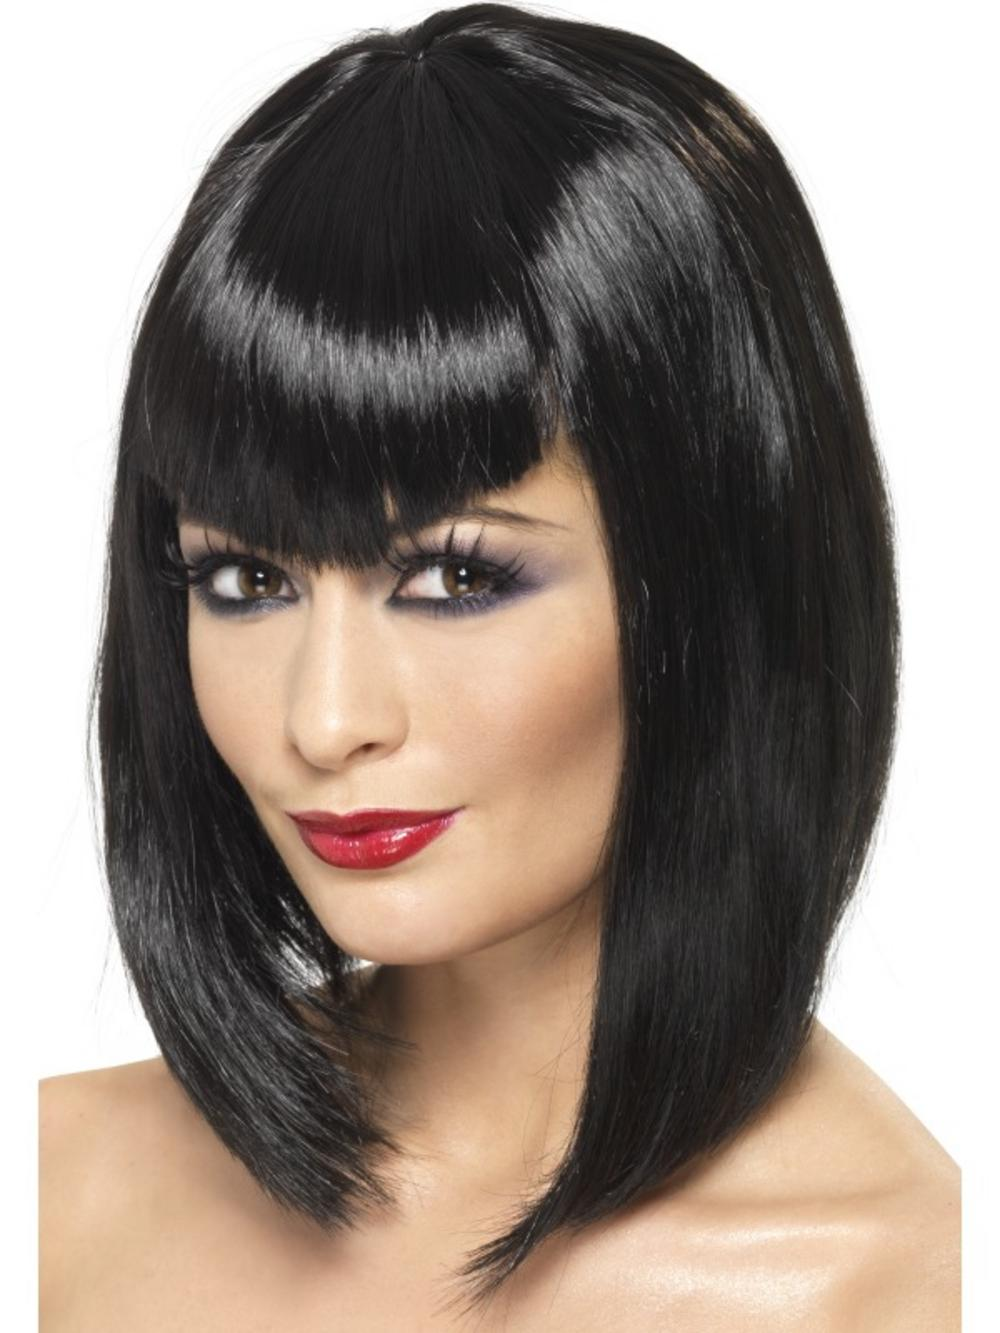 black vamp halloween wig | ladies' fancy dress wigs | mega fancy dress